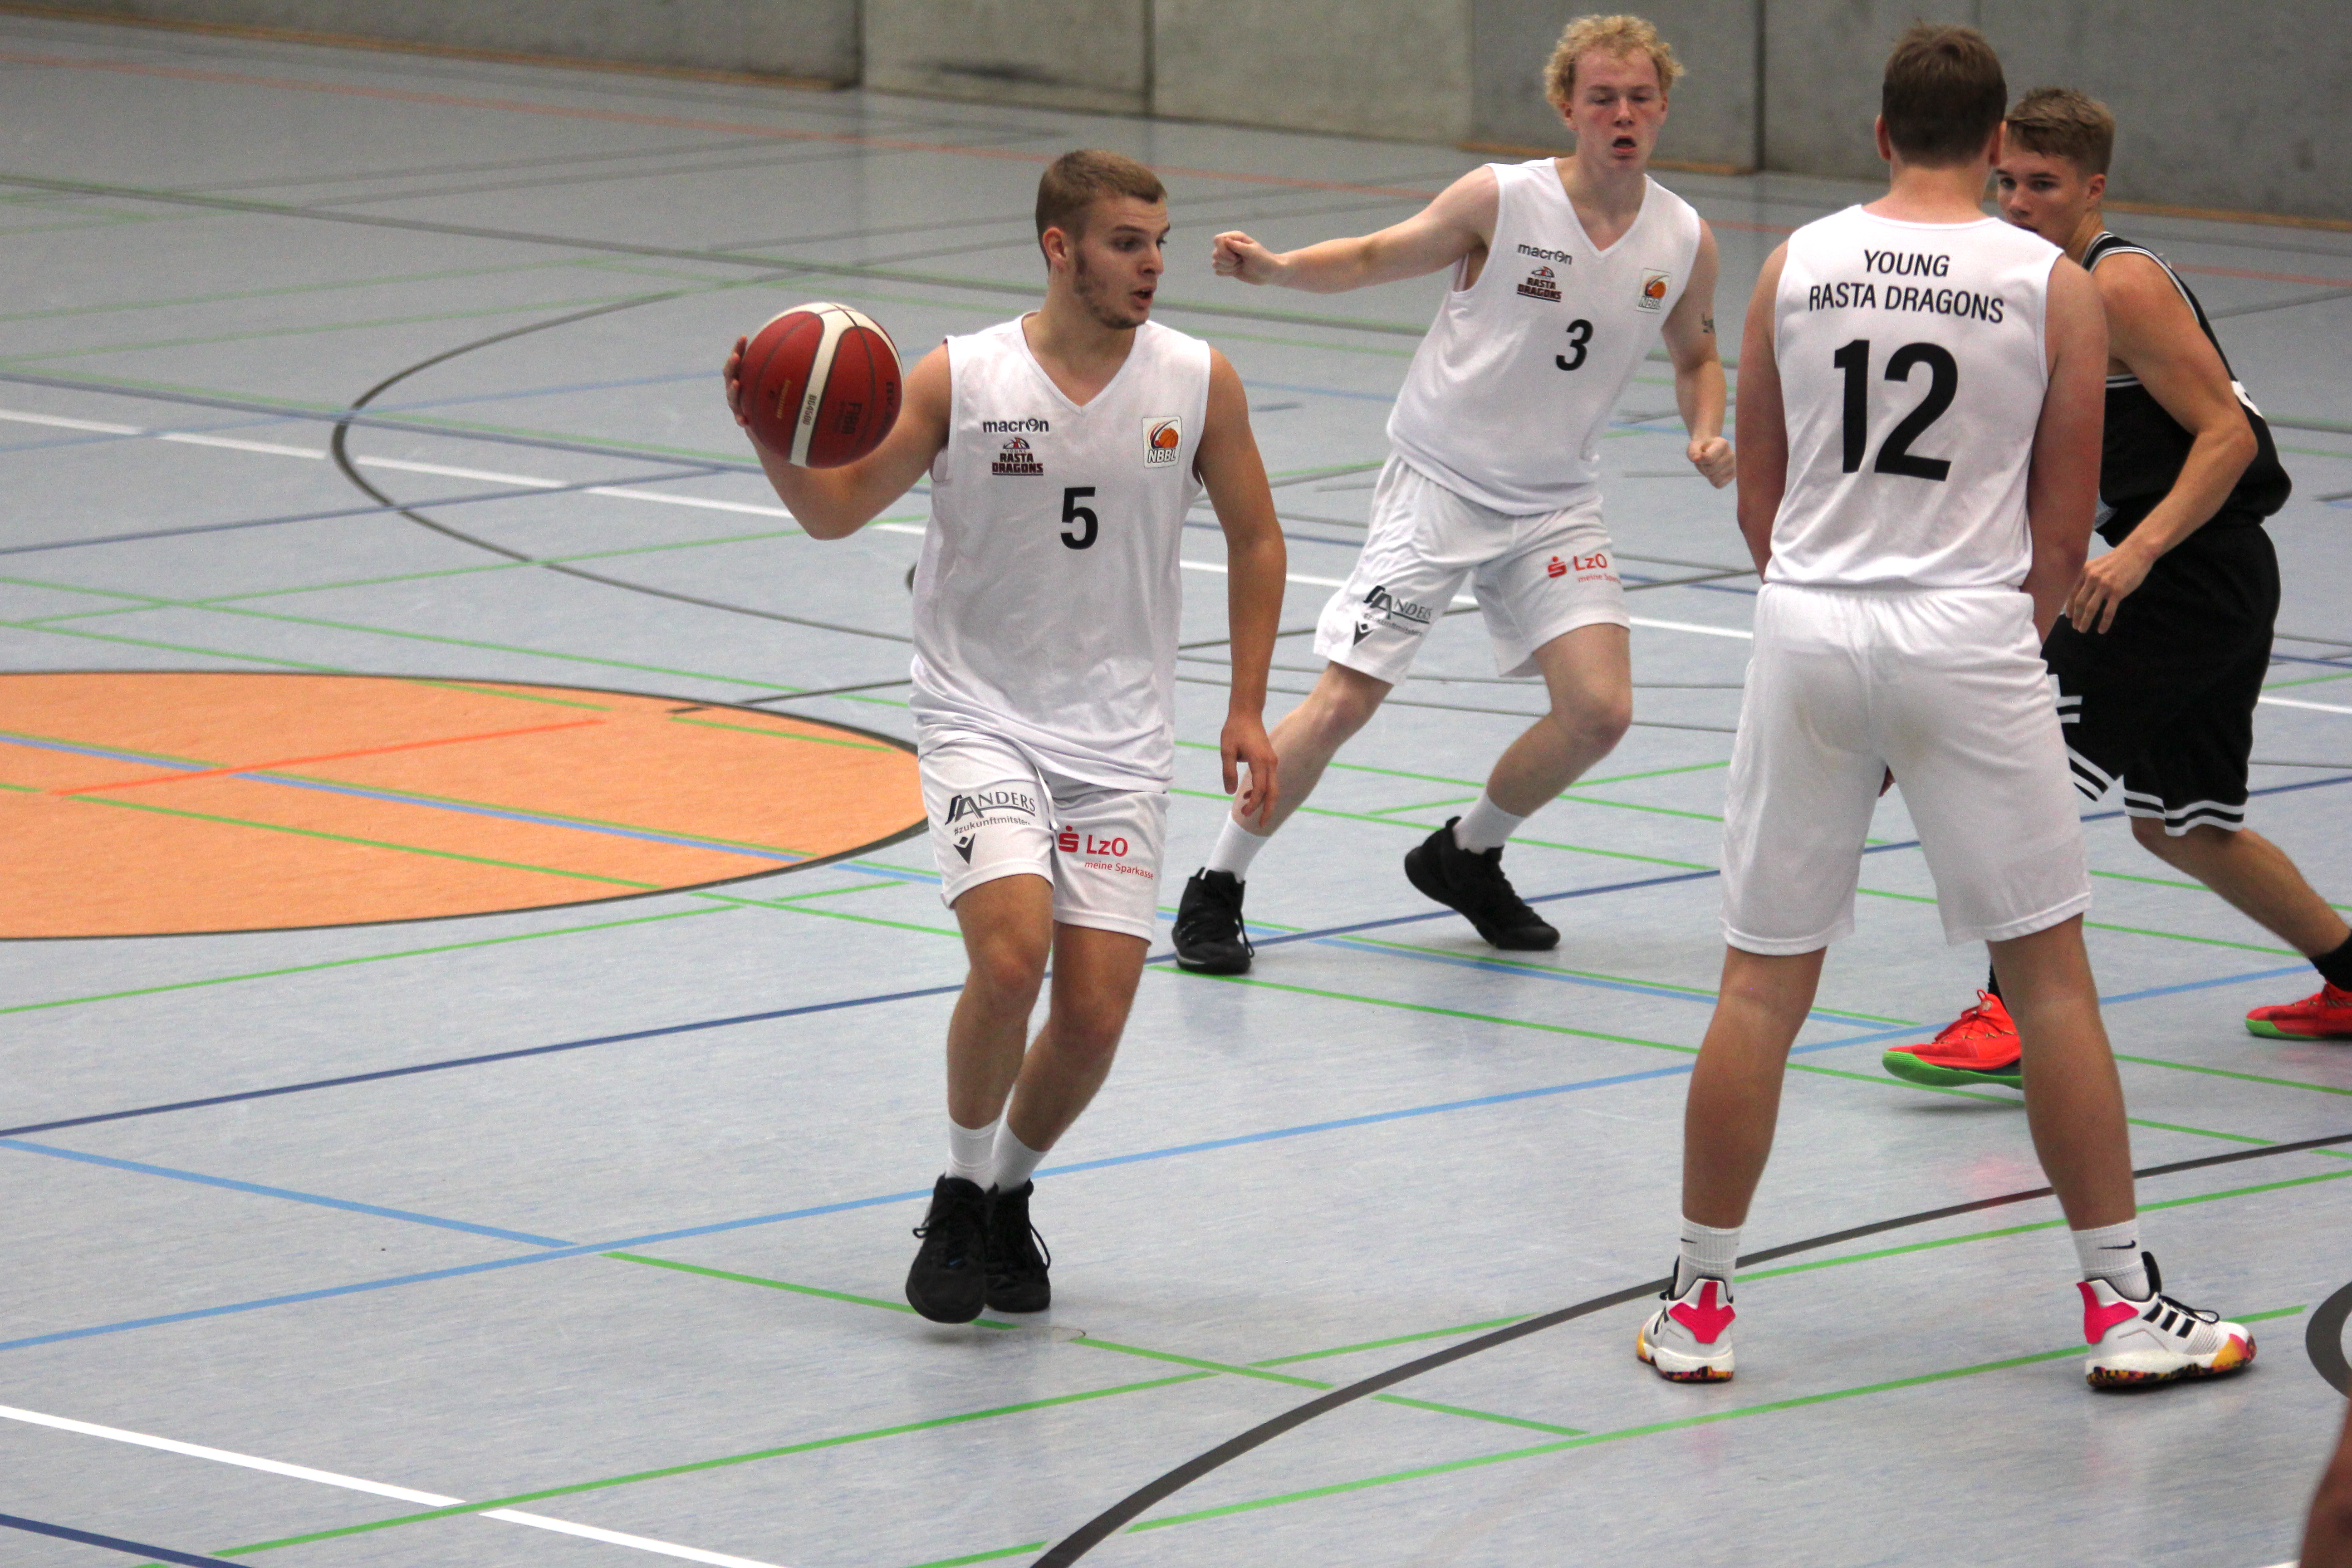 NBBL_20-21_YOUNG-RASTA-DRAGONS_Münster_Spieltag1_Torge-Buthmann_16